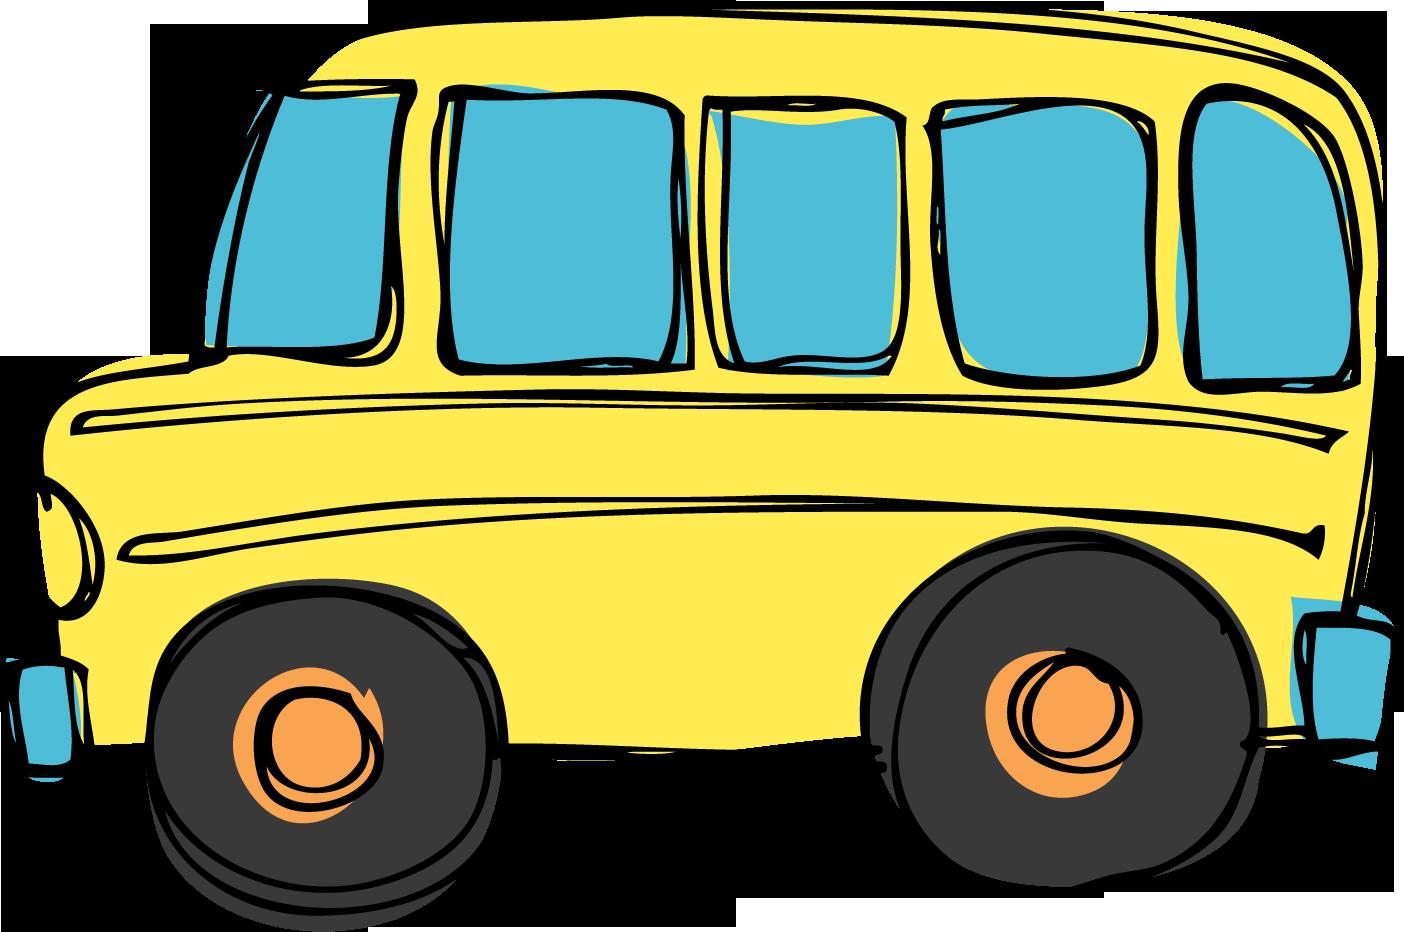 1404x932 School Bus Border Clip Art Free Clipart Images